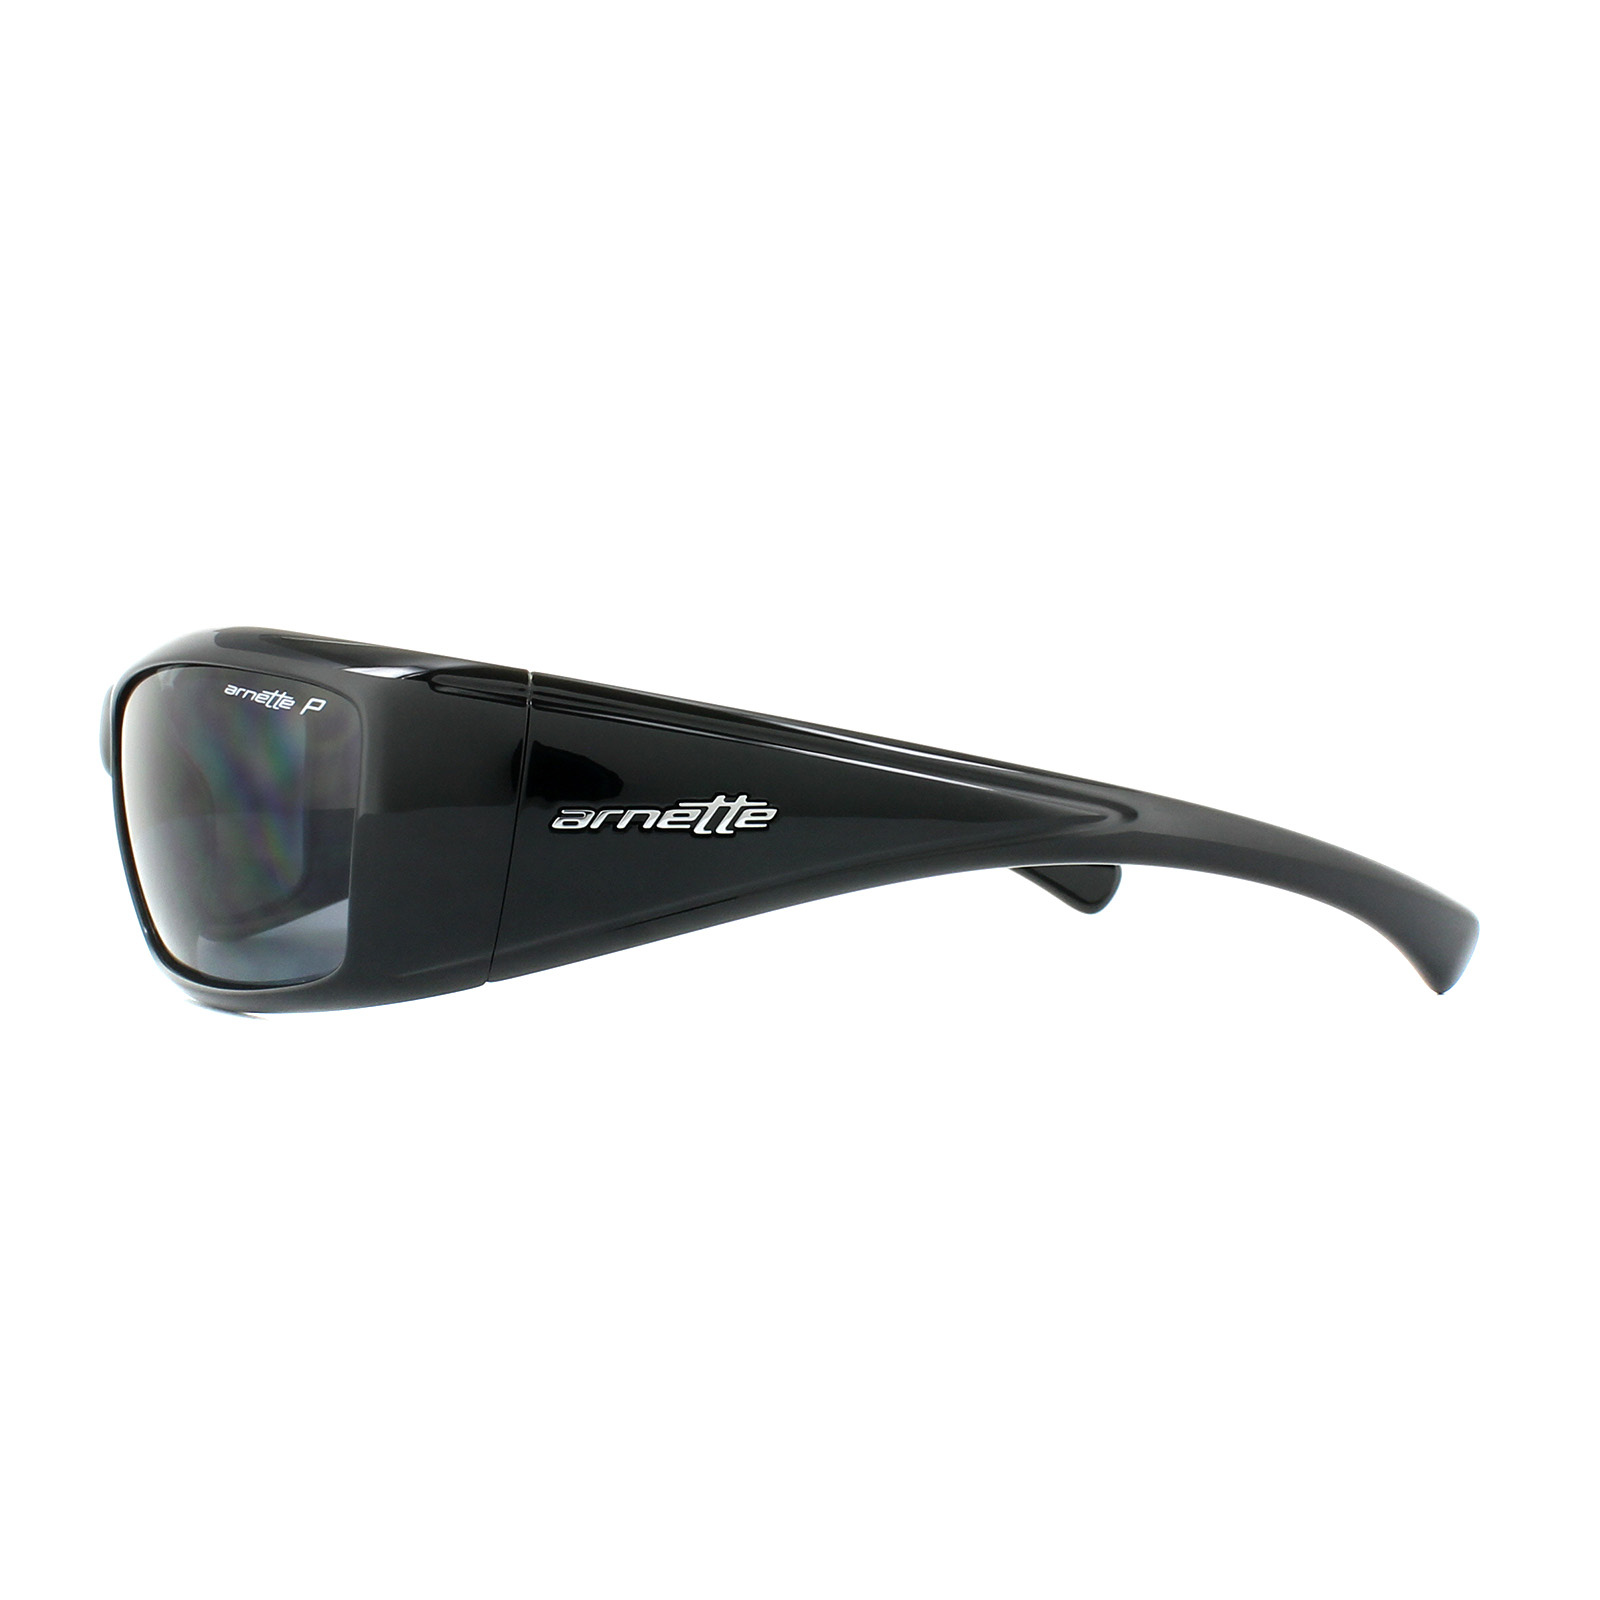 54f6634e08d2 Arnette Sunglasses Rage XL 4077 41/81 Black Polarized 726770316508 ...